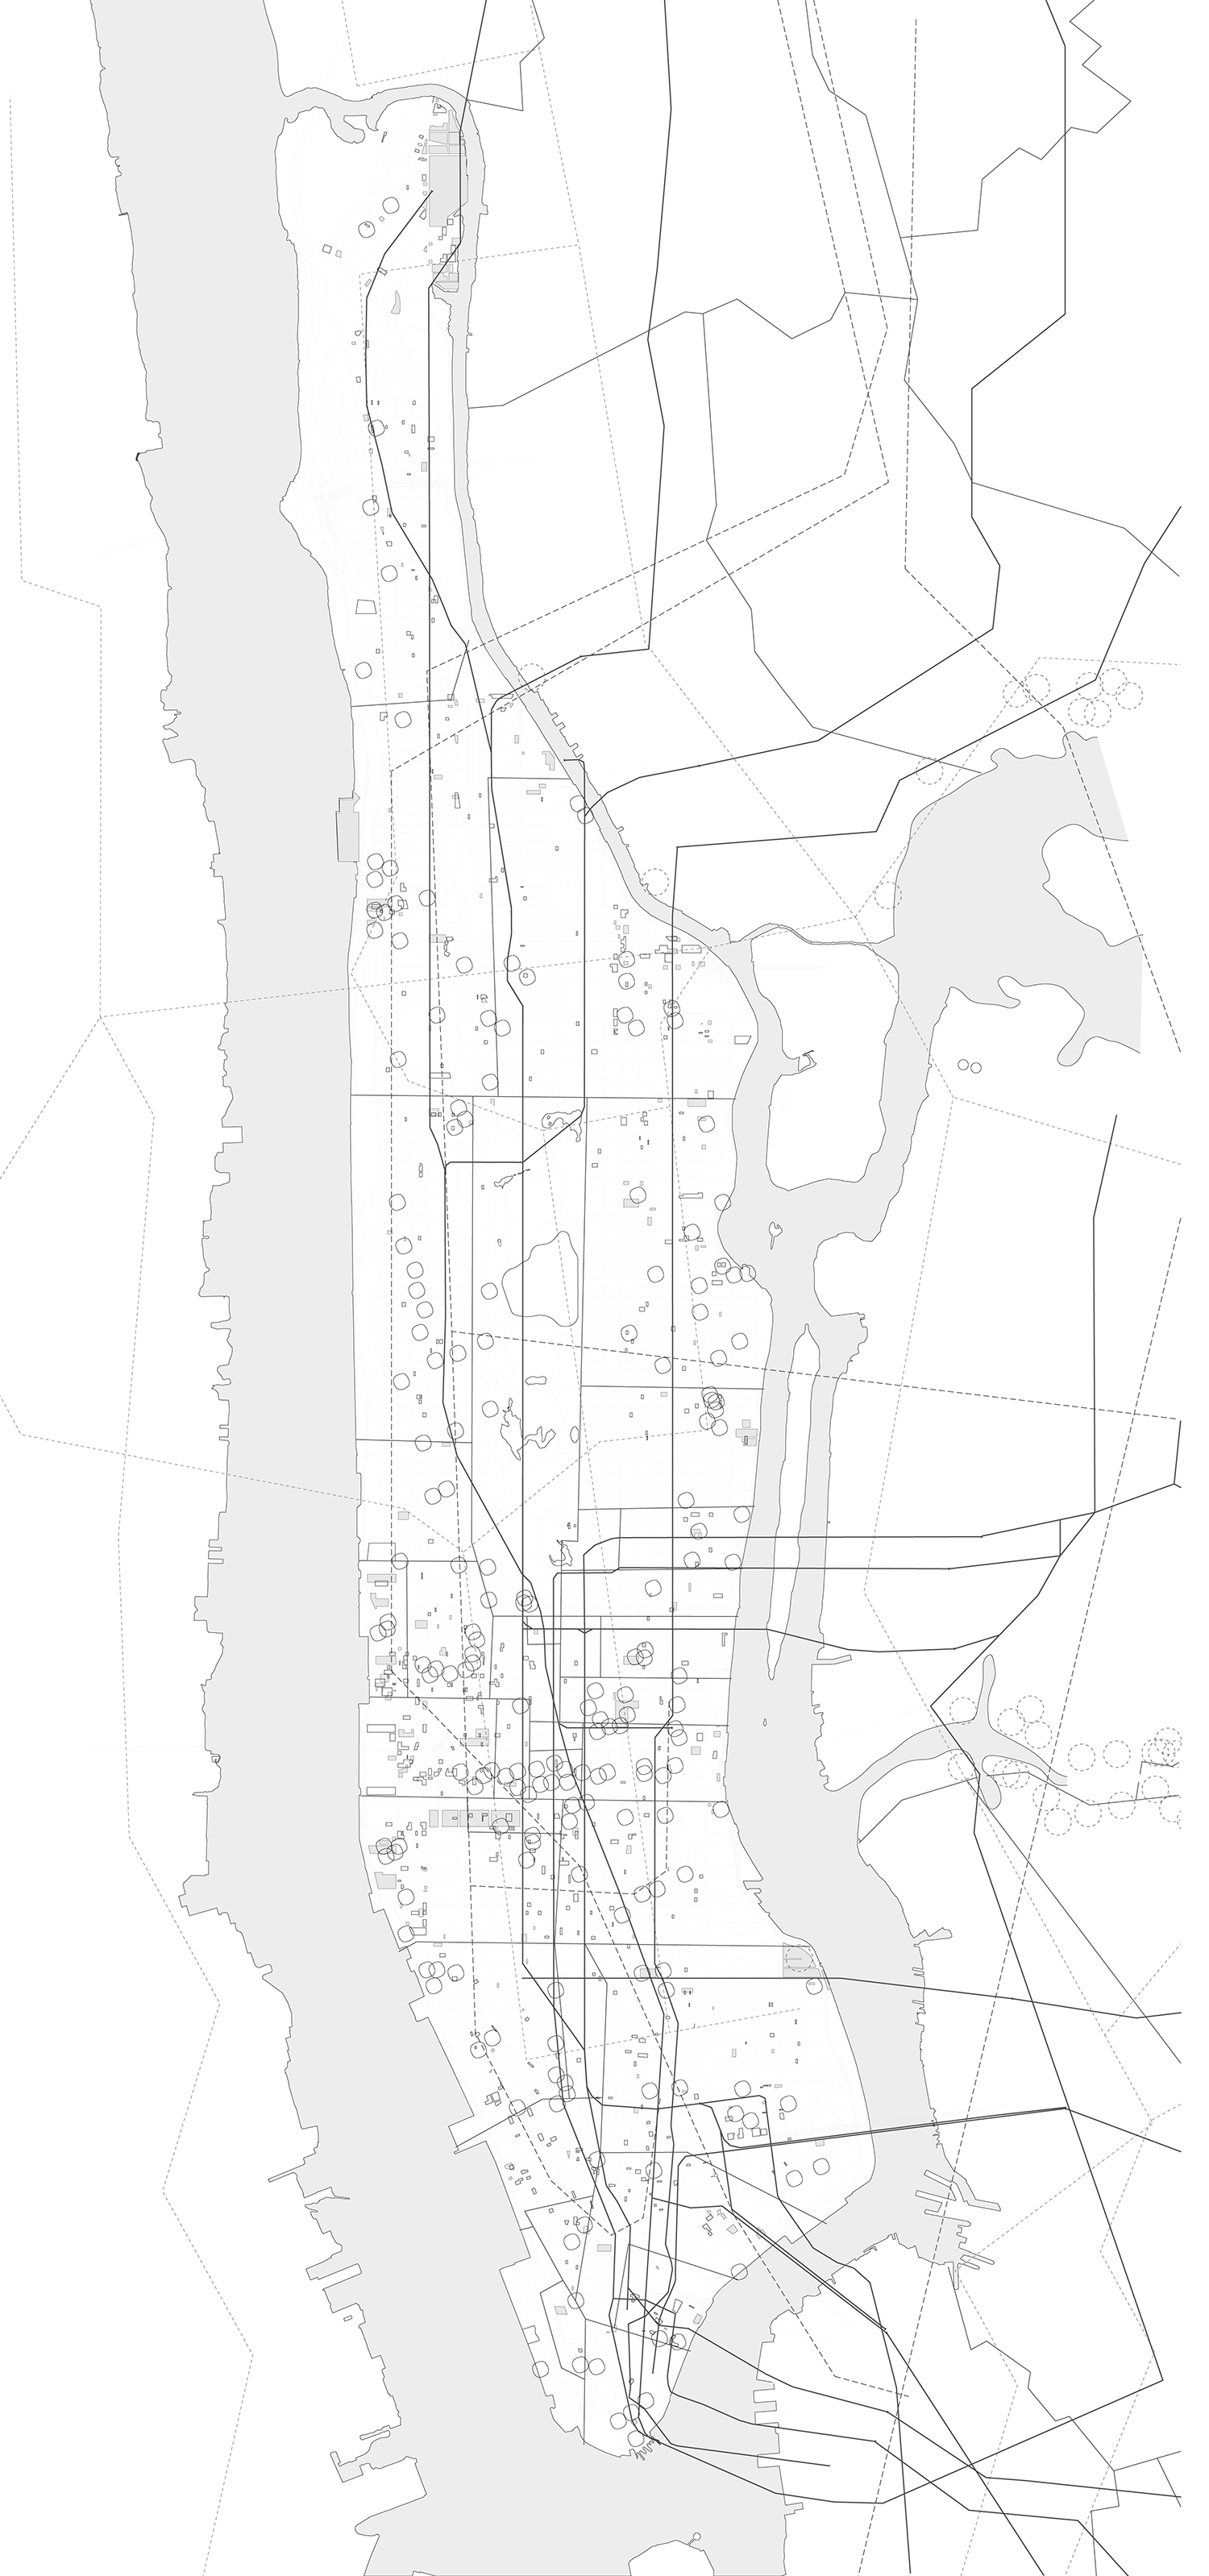 Grid_NYC Plan_new-01.jpg